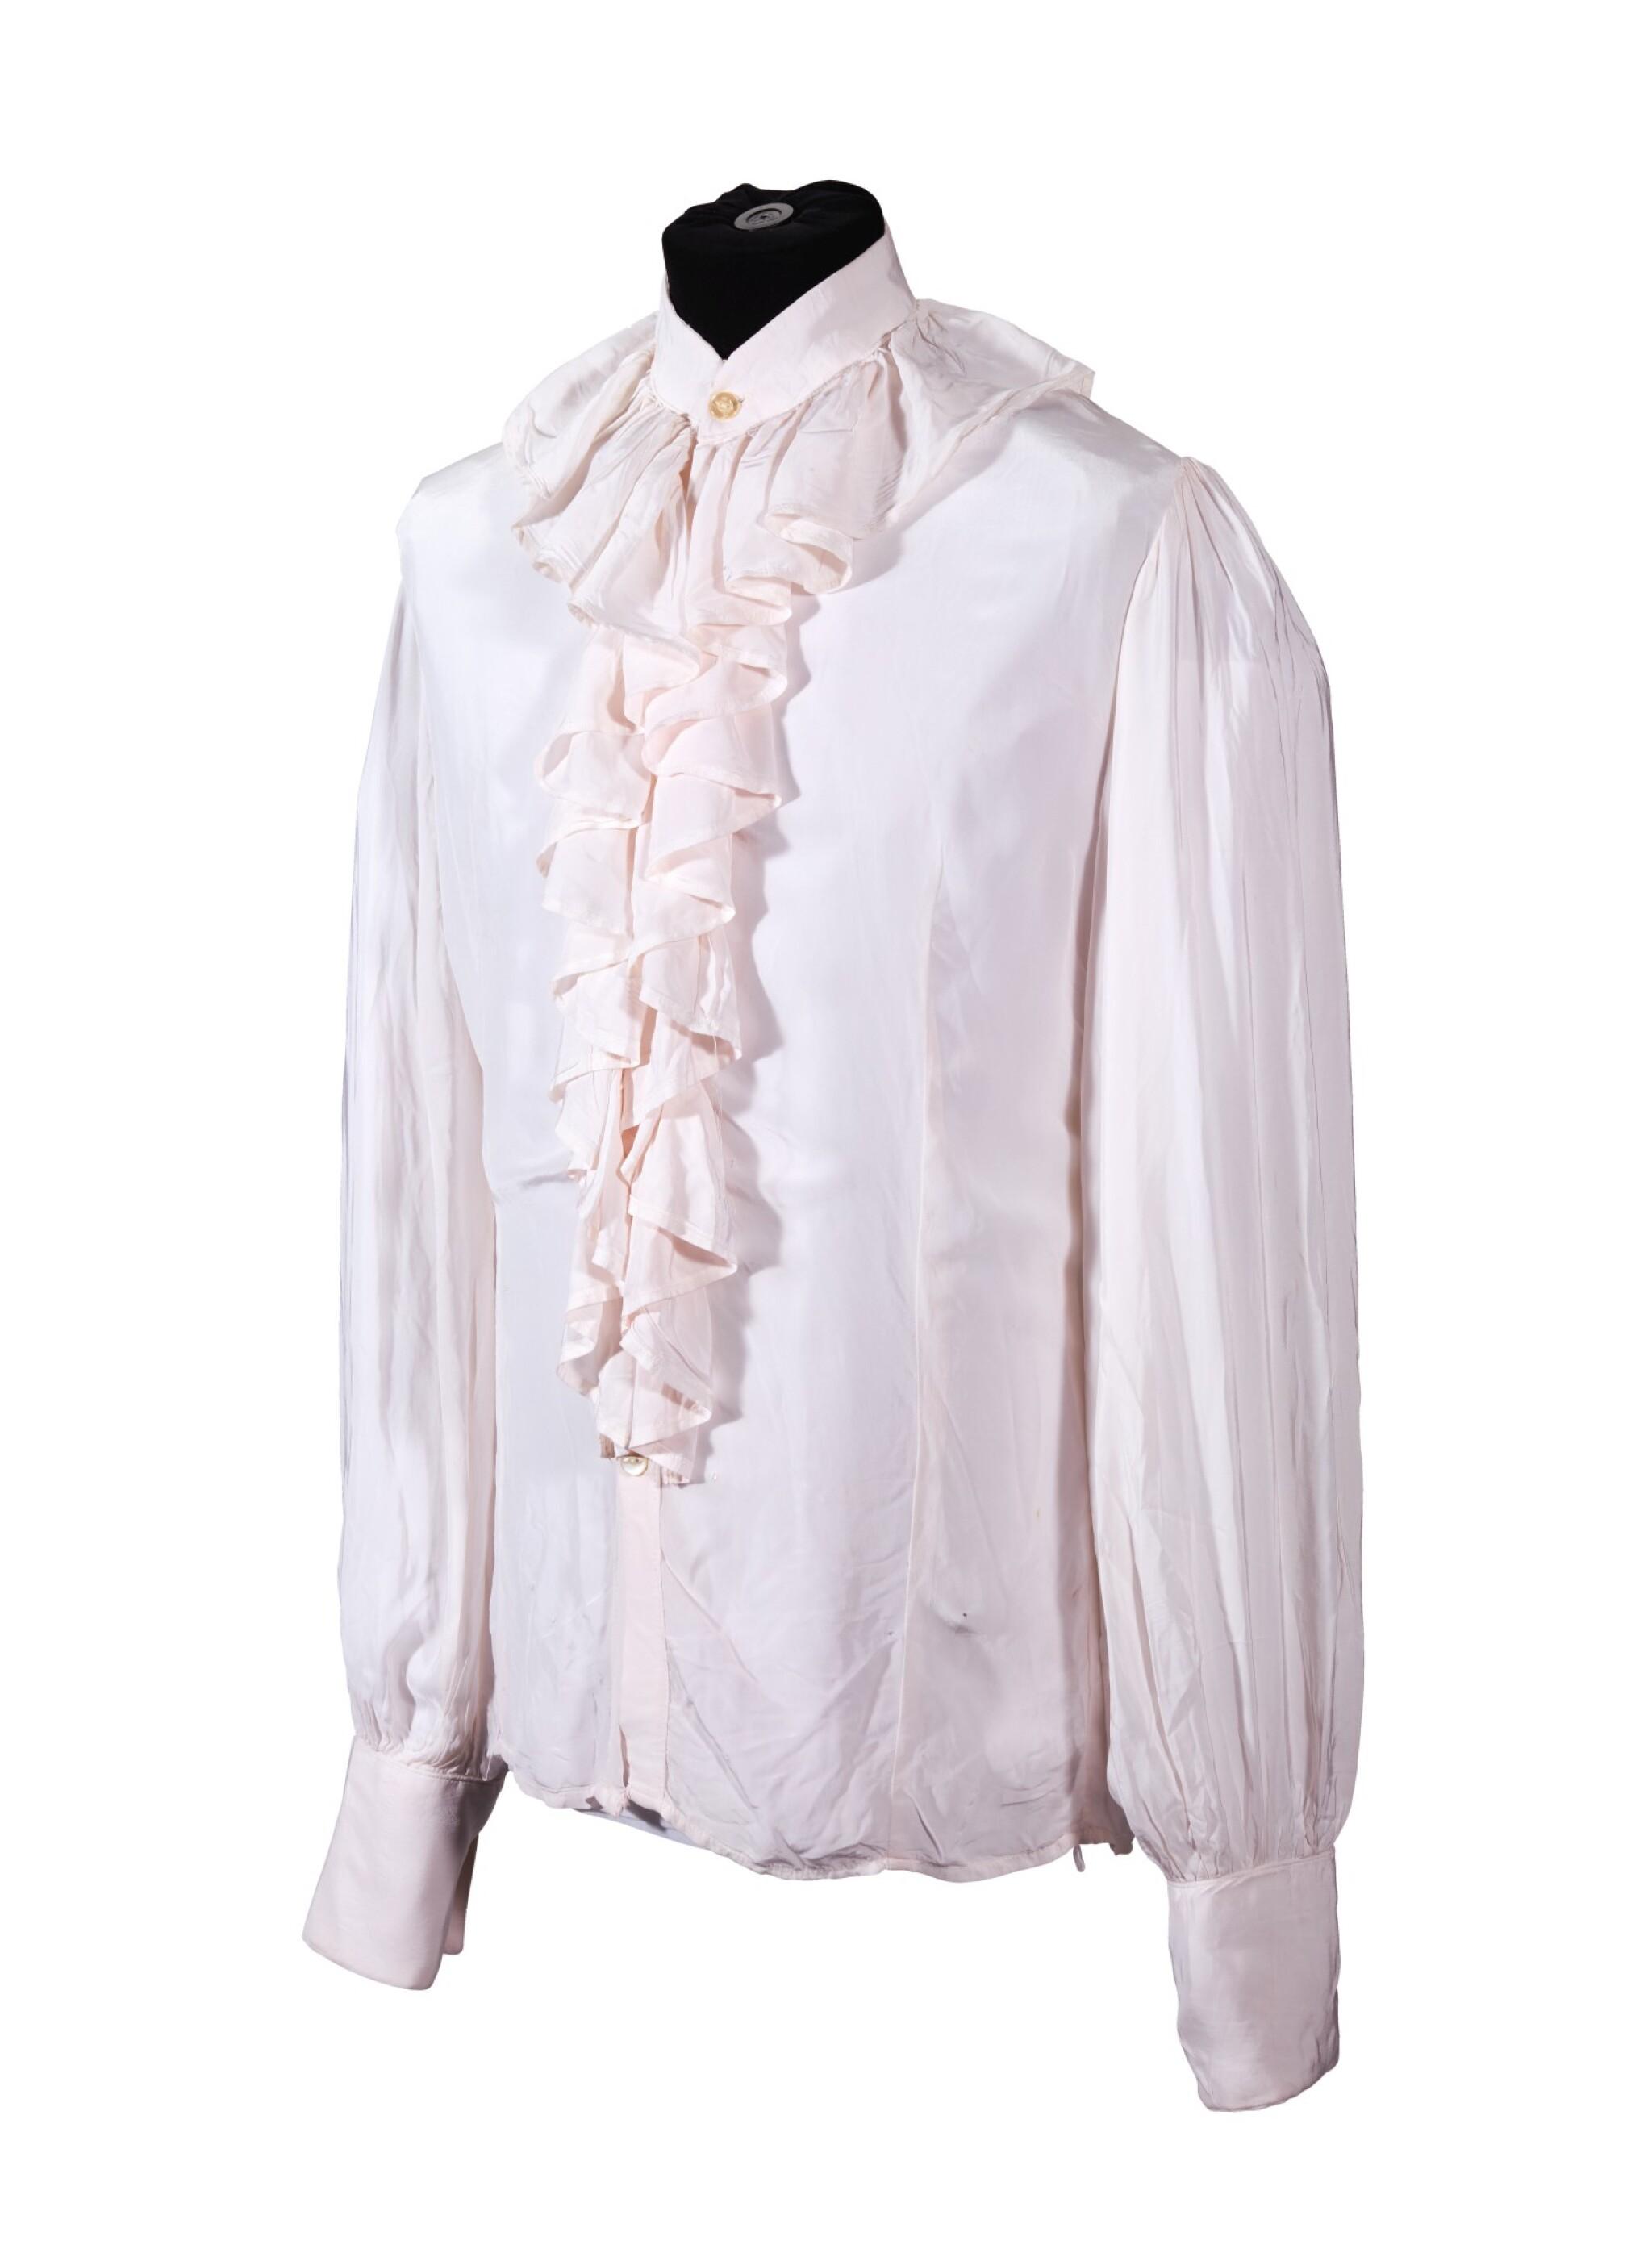 GEORGE HARRISON   White shirt with ruffle collar, c.1968